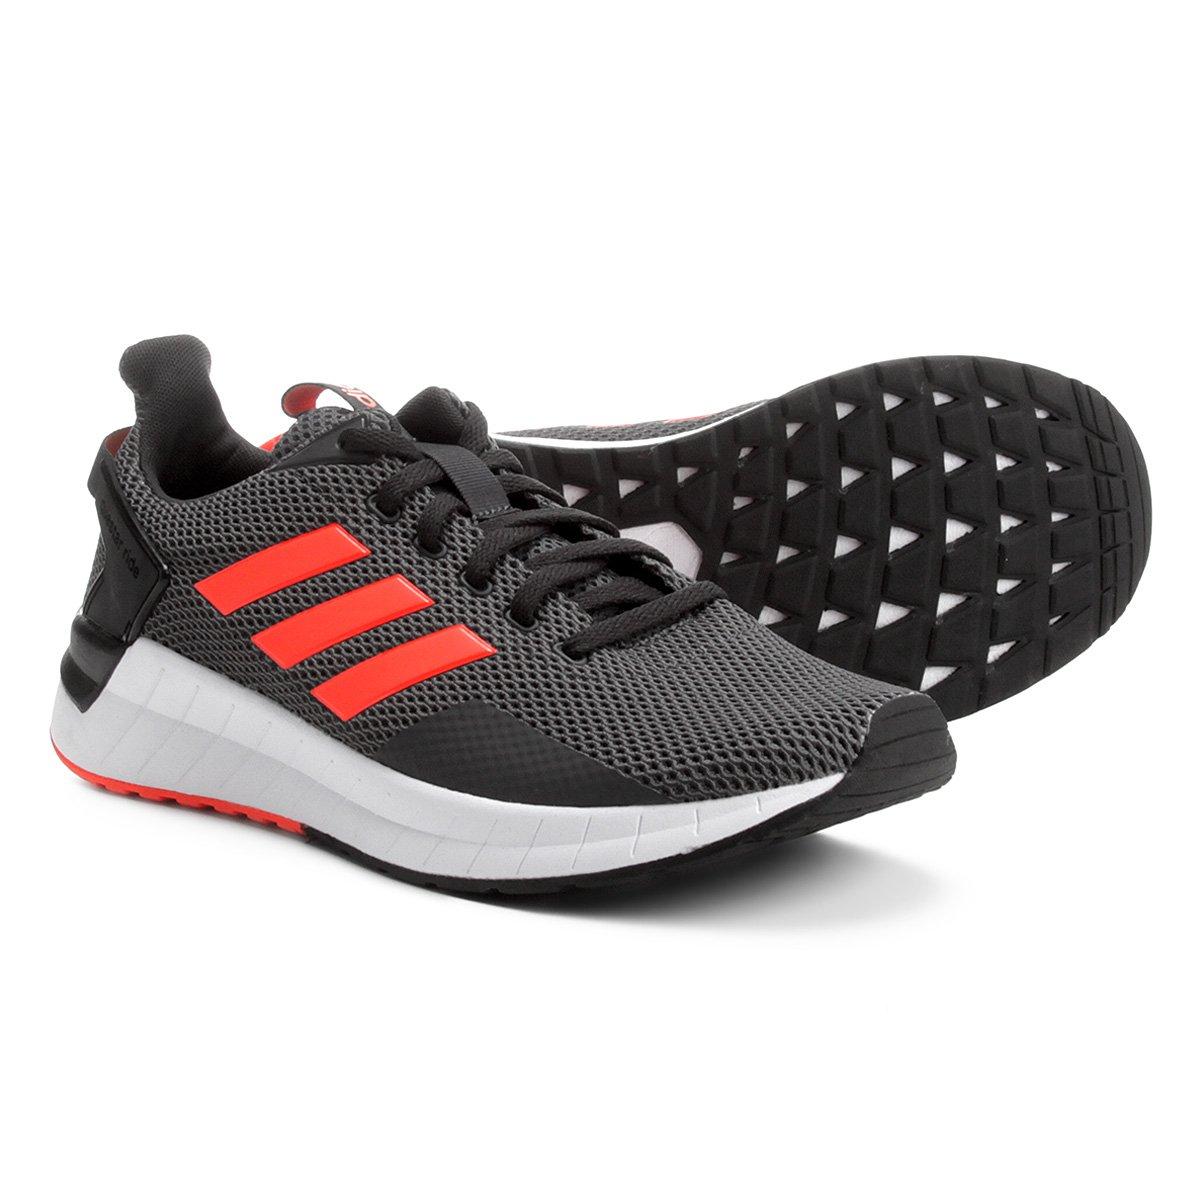 be1fbe6ec Tênis Adidas Questar Ride Masculino - Compre Agora